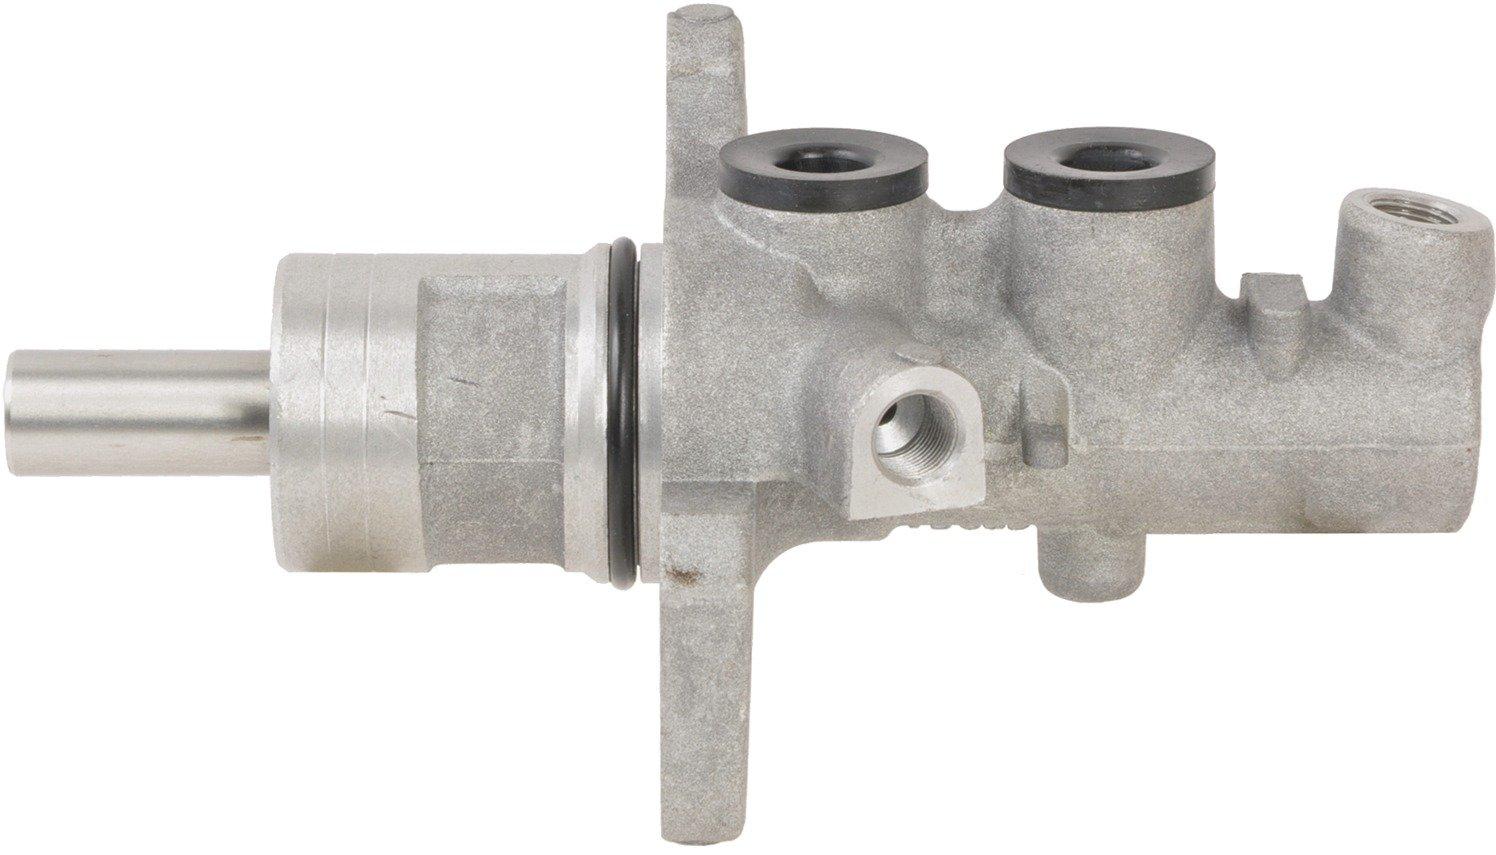 Cardone Select Cardone 13-3052 New Master Cylinder